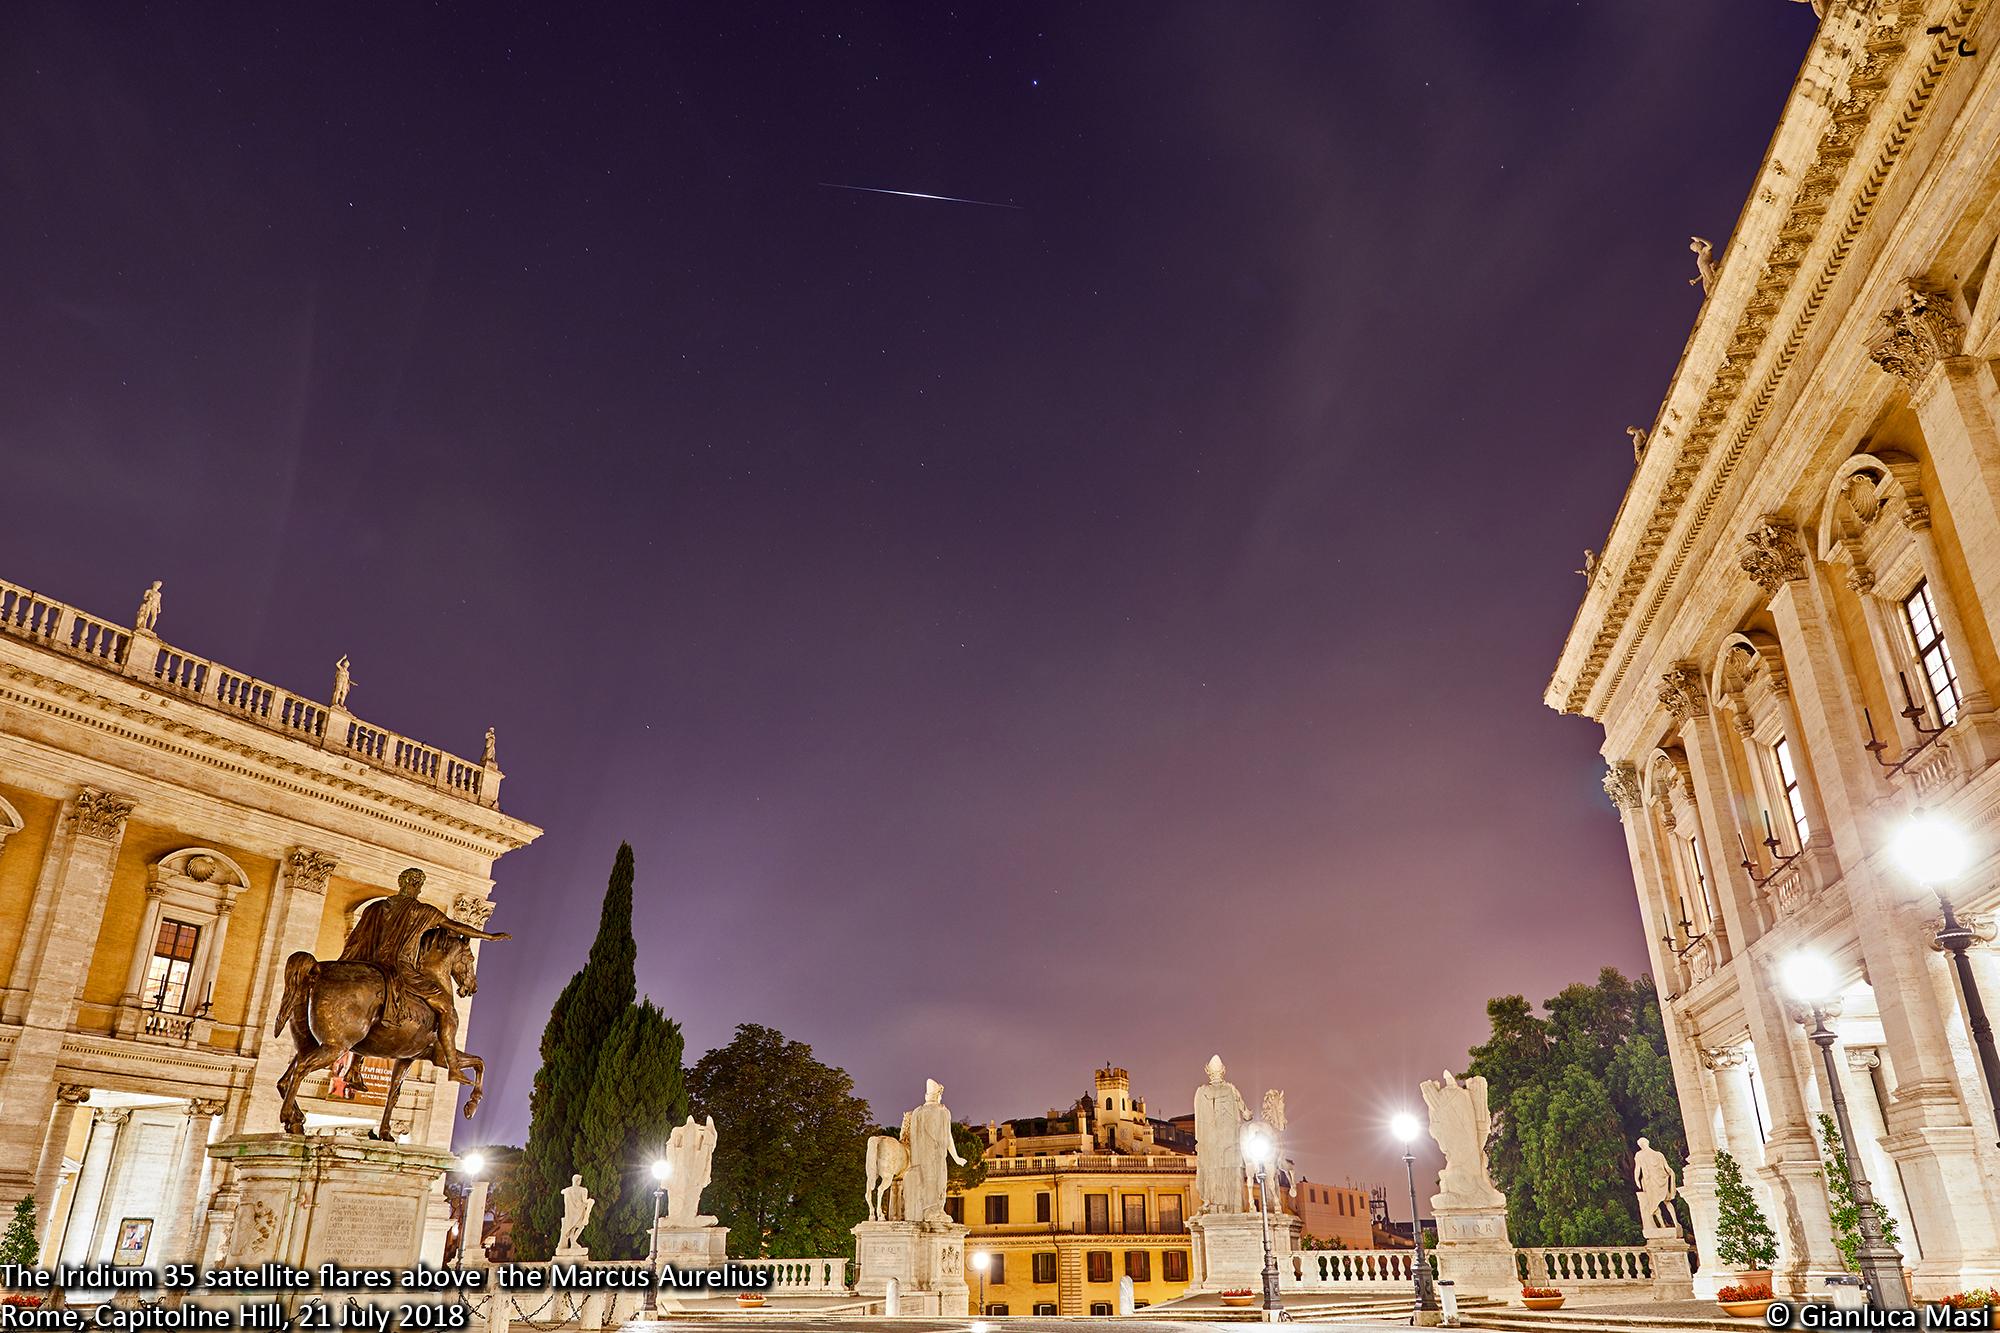 Iridium 35 flashes above Rome - 21 July 2018 - The Virtual